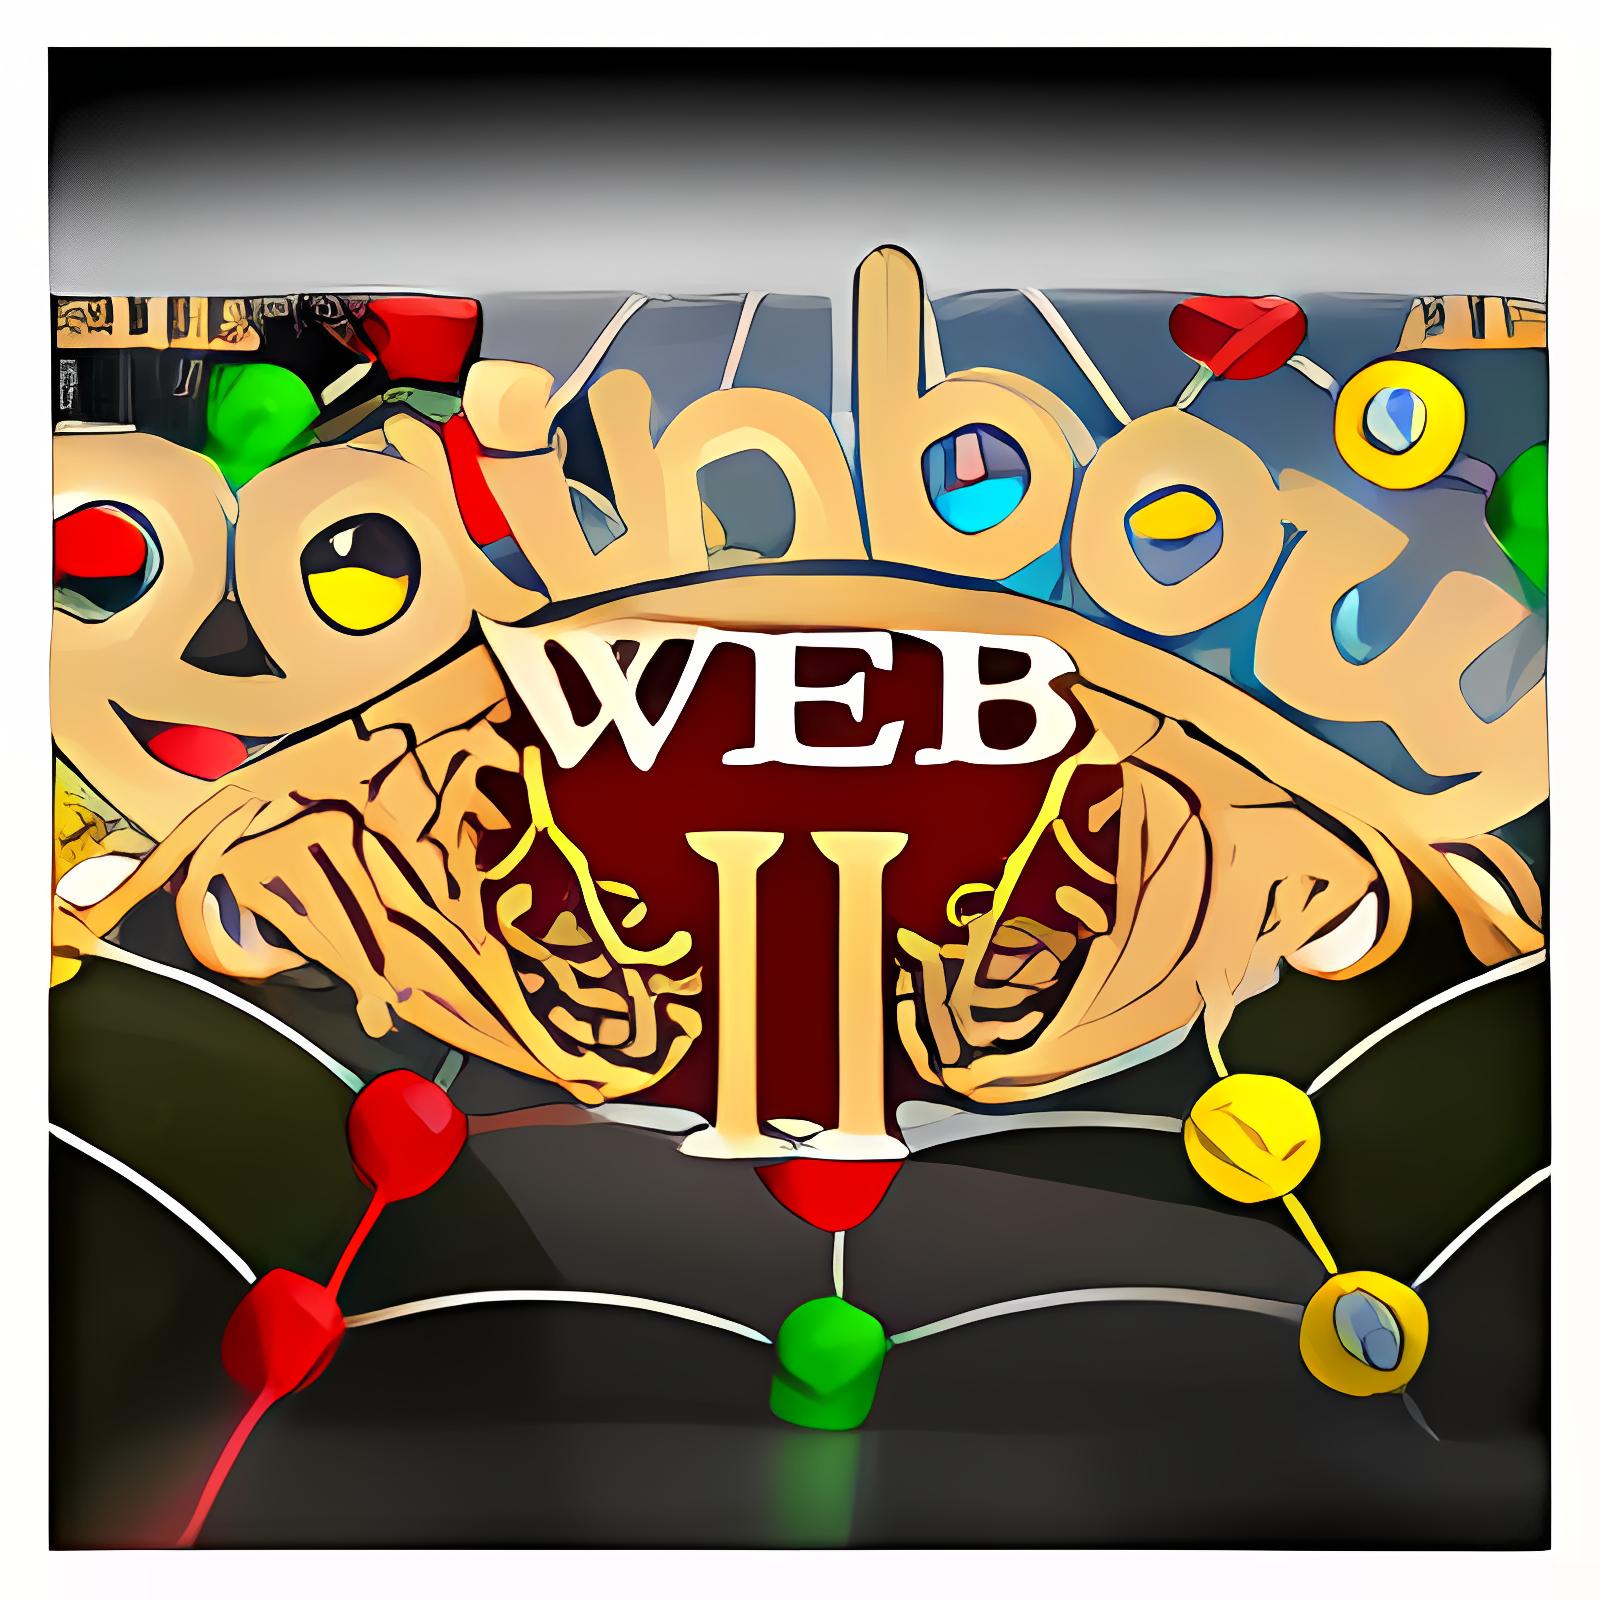 Rainbow Web 2 1.0